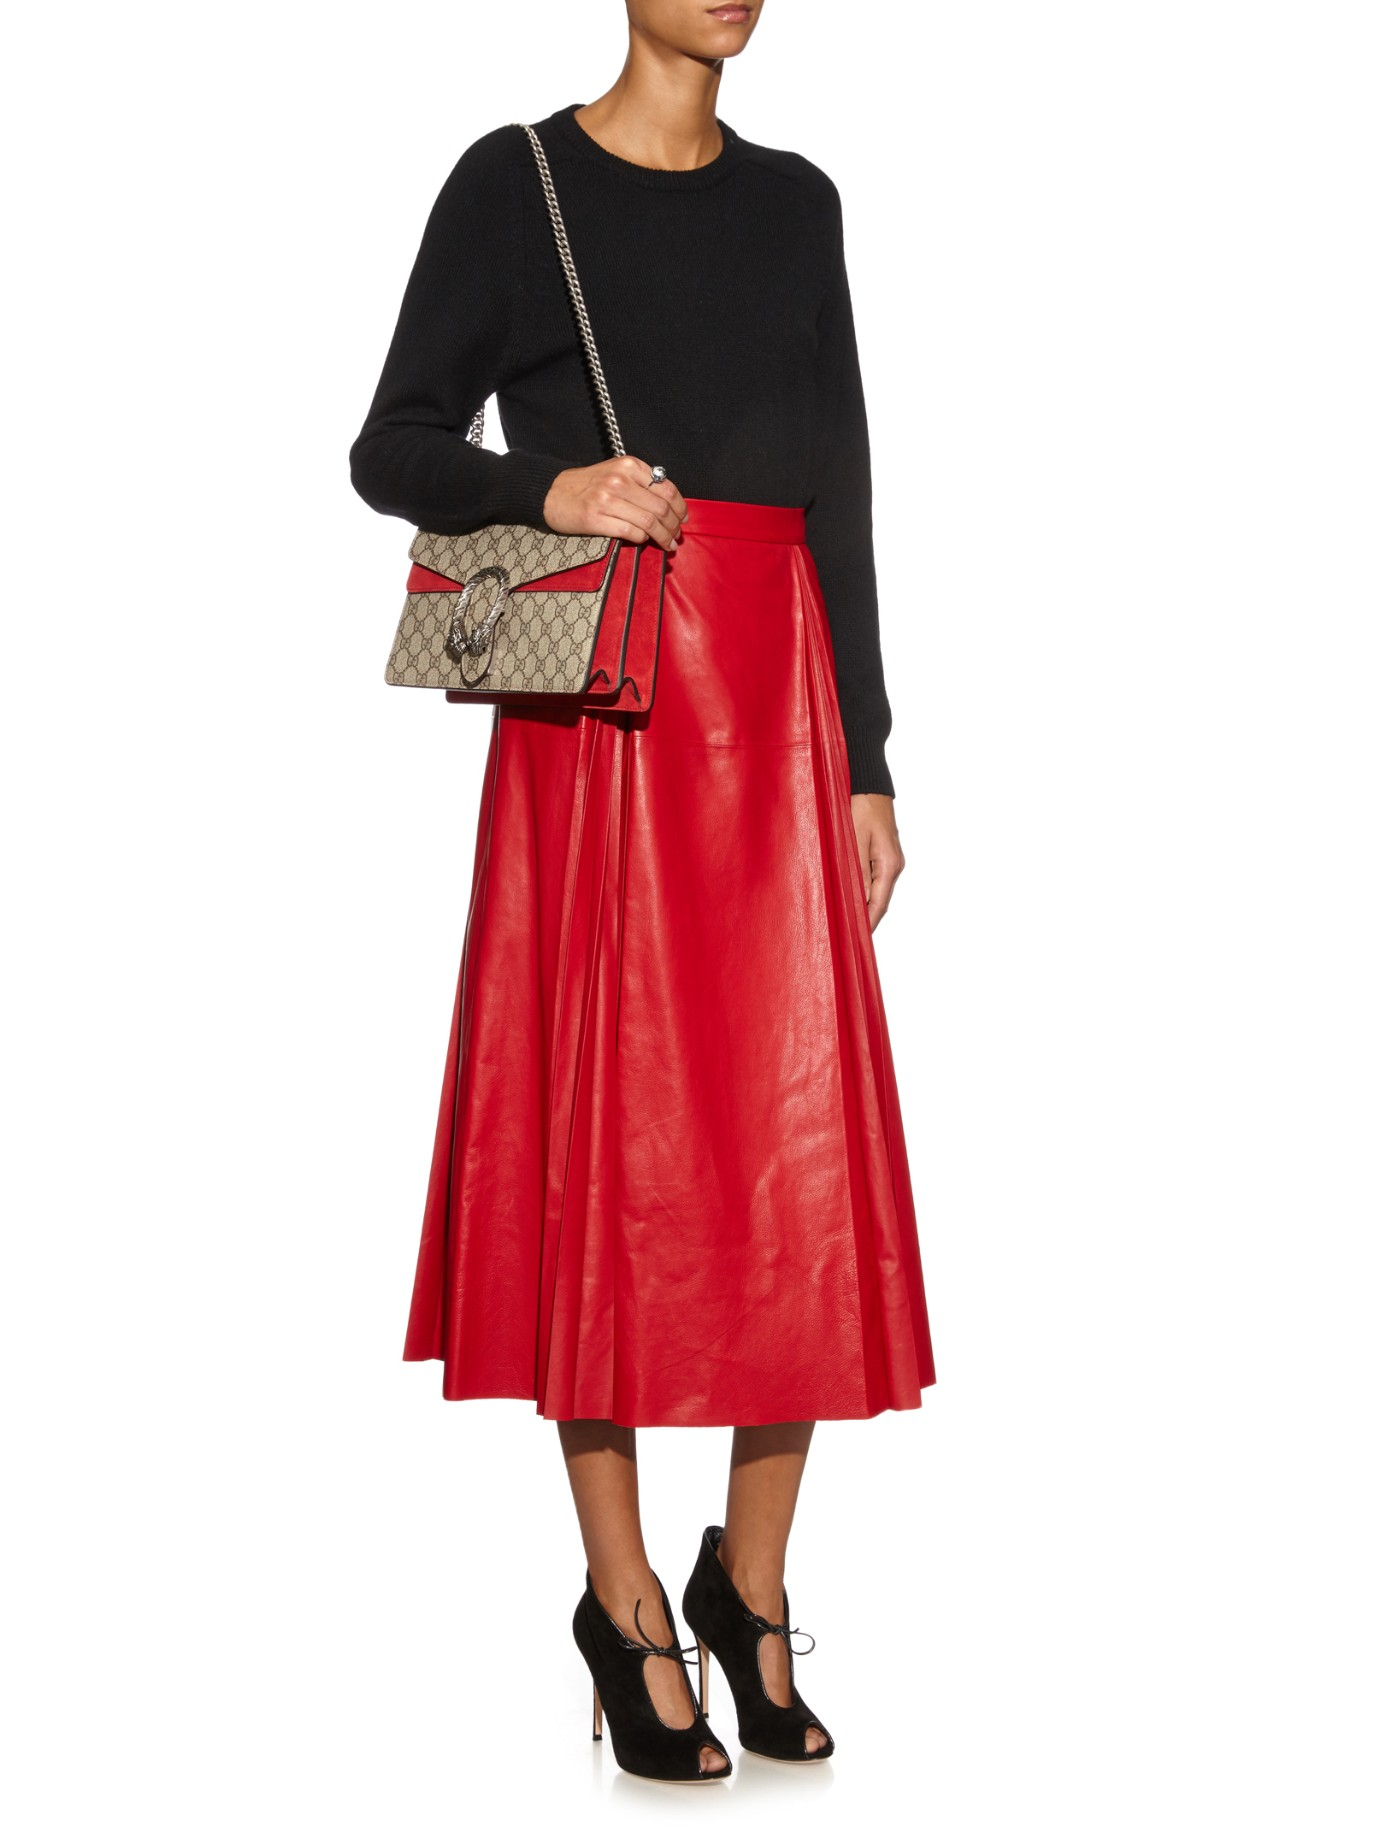 13f0b75a90e0 Gucci Dionysus GG Supreme Canvas Shoulder Bag in Gray - Lyst